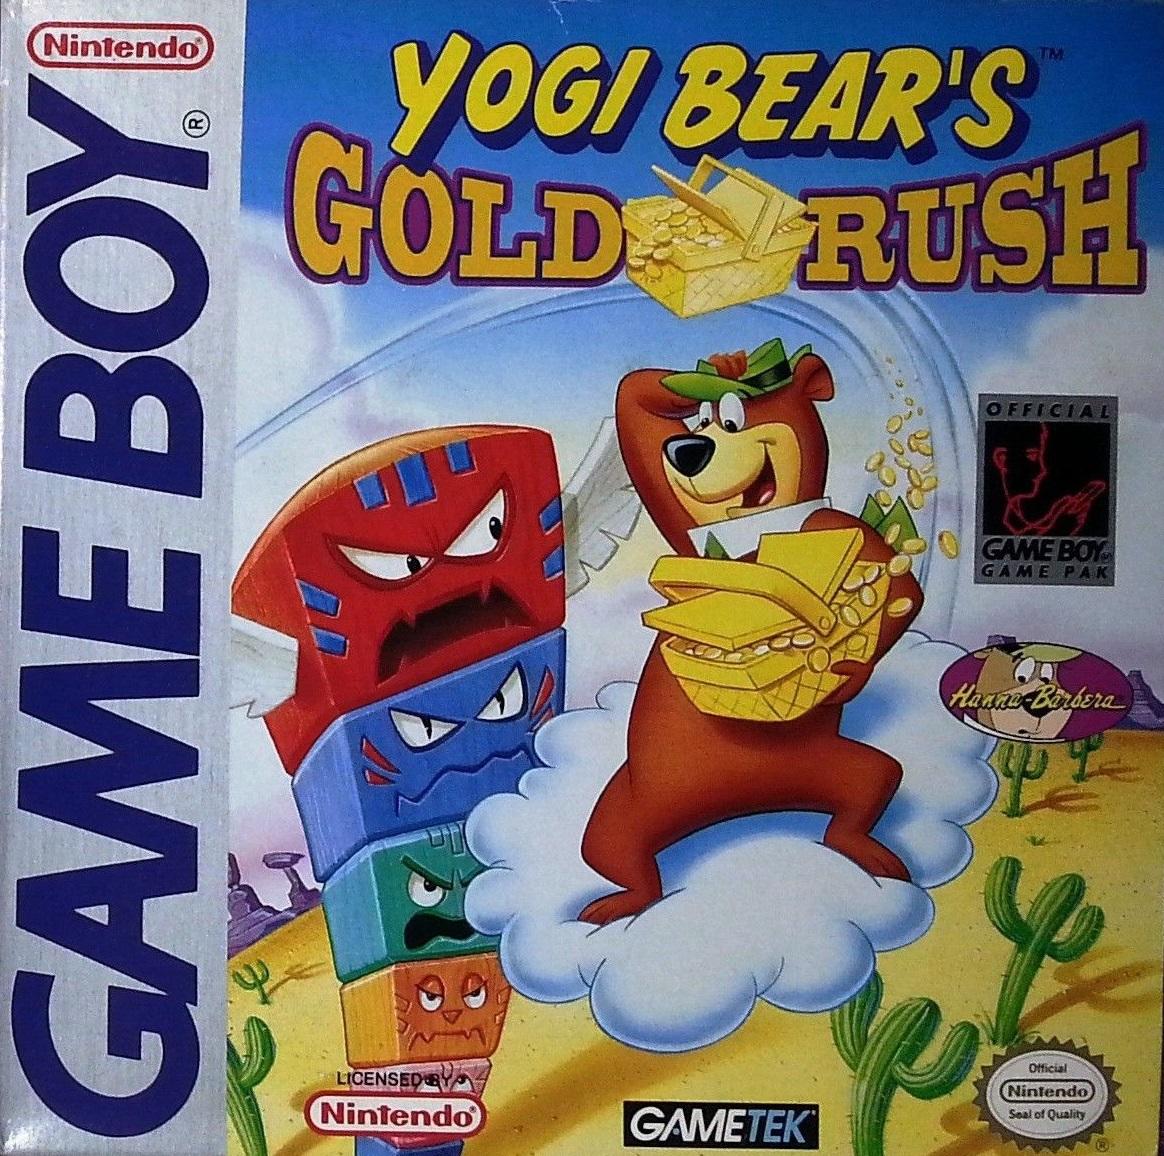 Yogi Bears Gold Rush